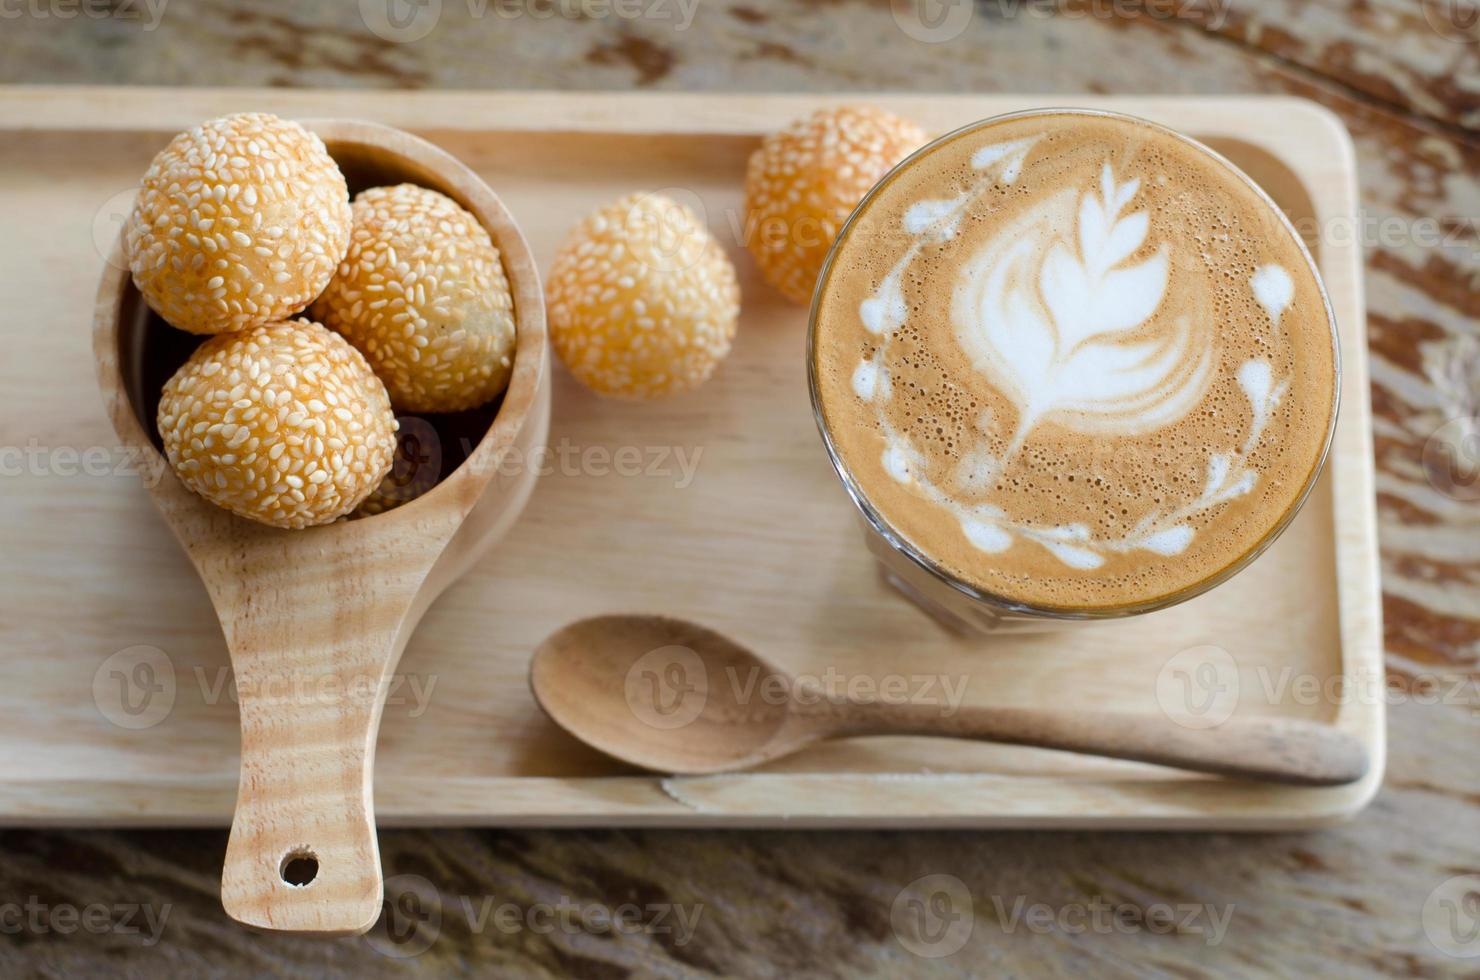 cigno di latte art caffè e caramelle foto